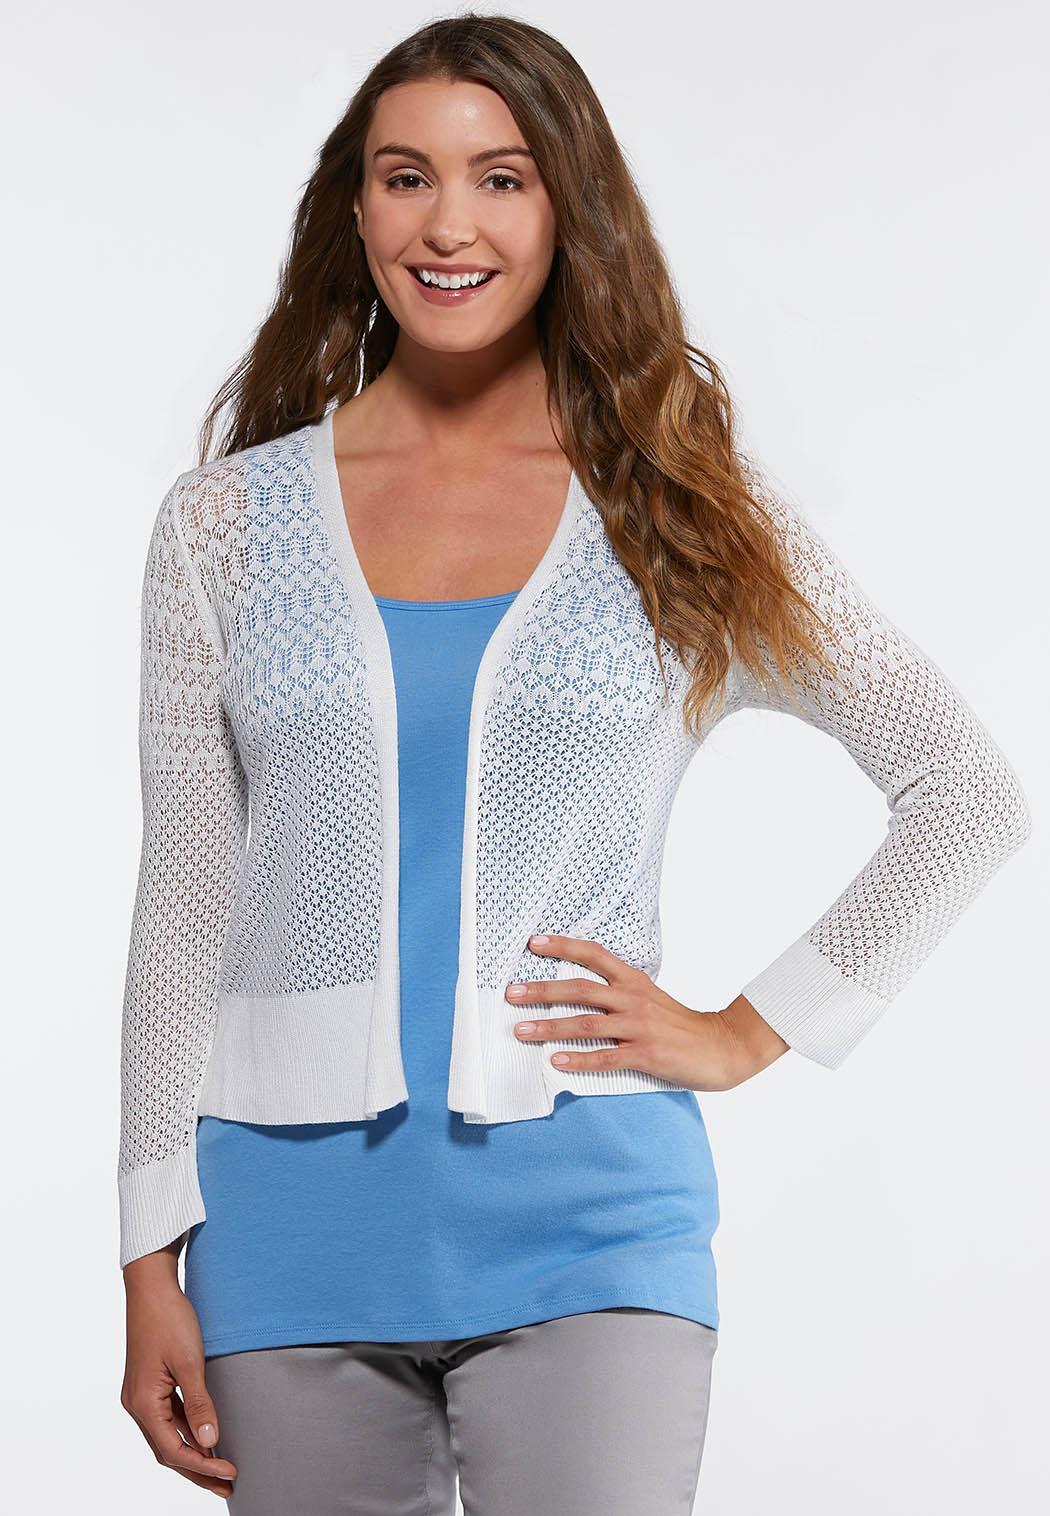 Delicate Cardigan Sweater